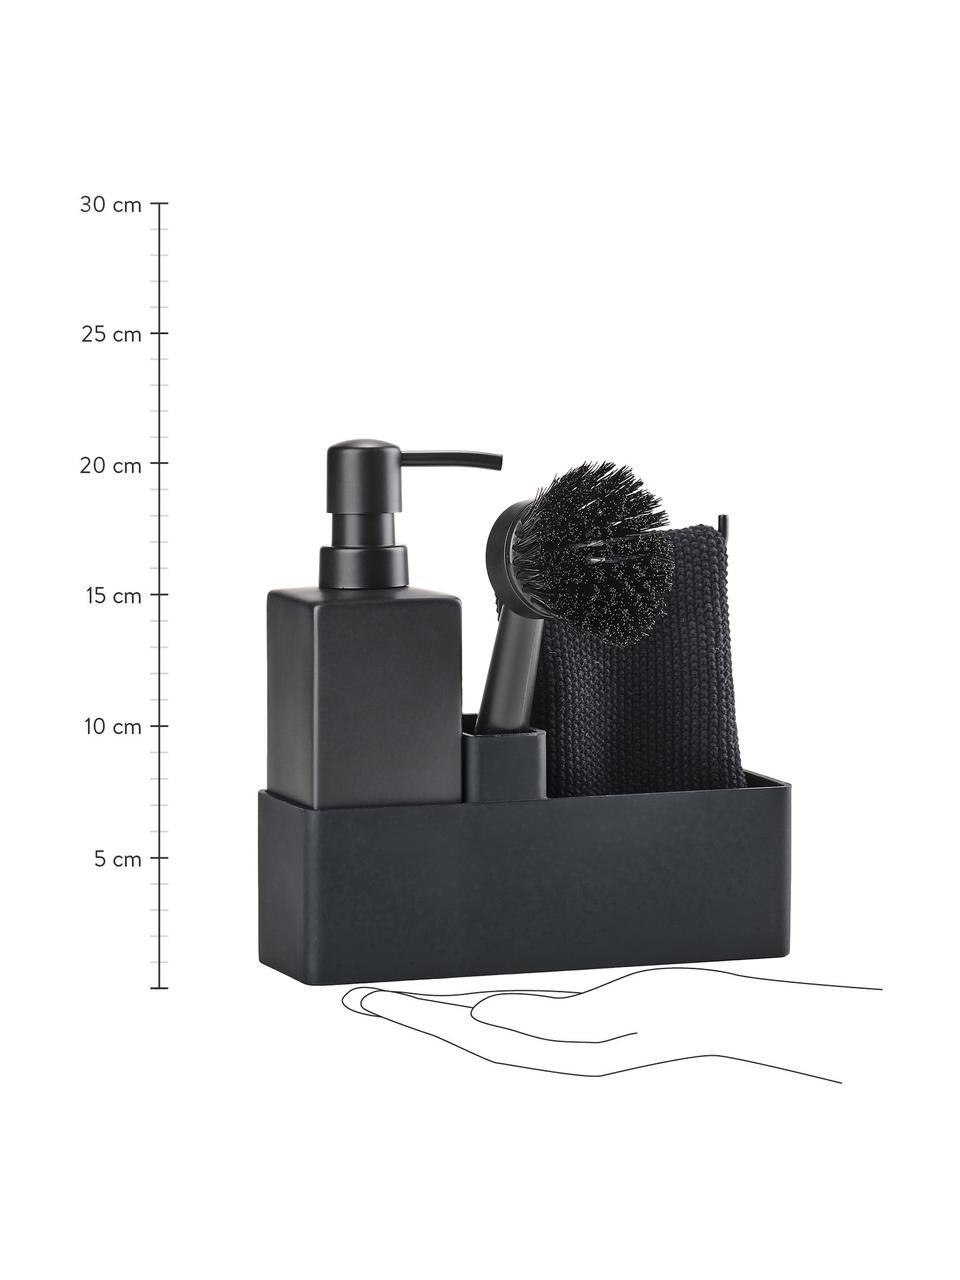 Spülmittelspender Parta mit Spülbürste, 3er-Set, Keramik, Silikon, Schwarz, 19 x 21 cm